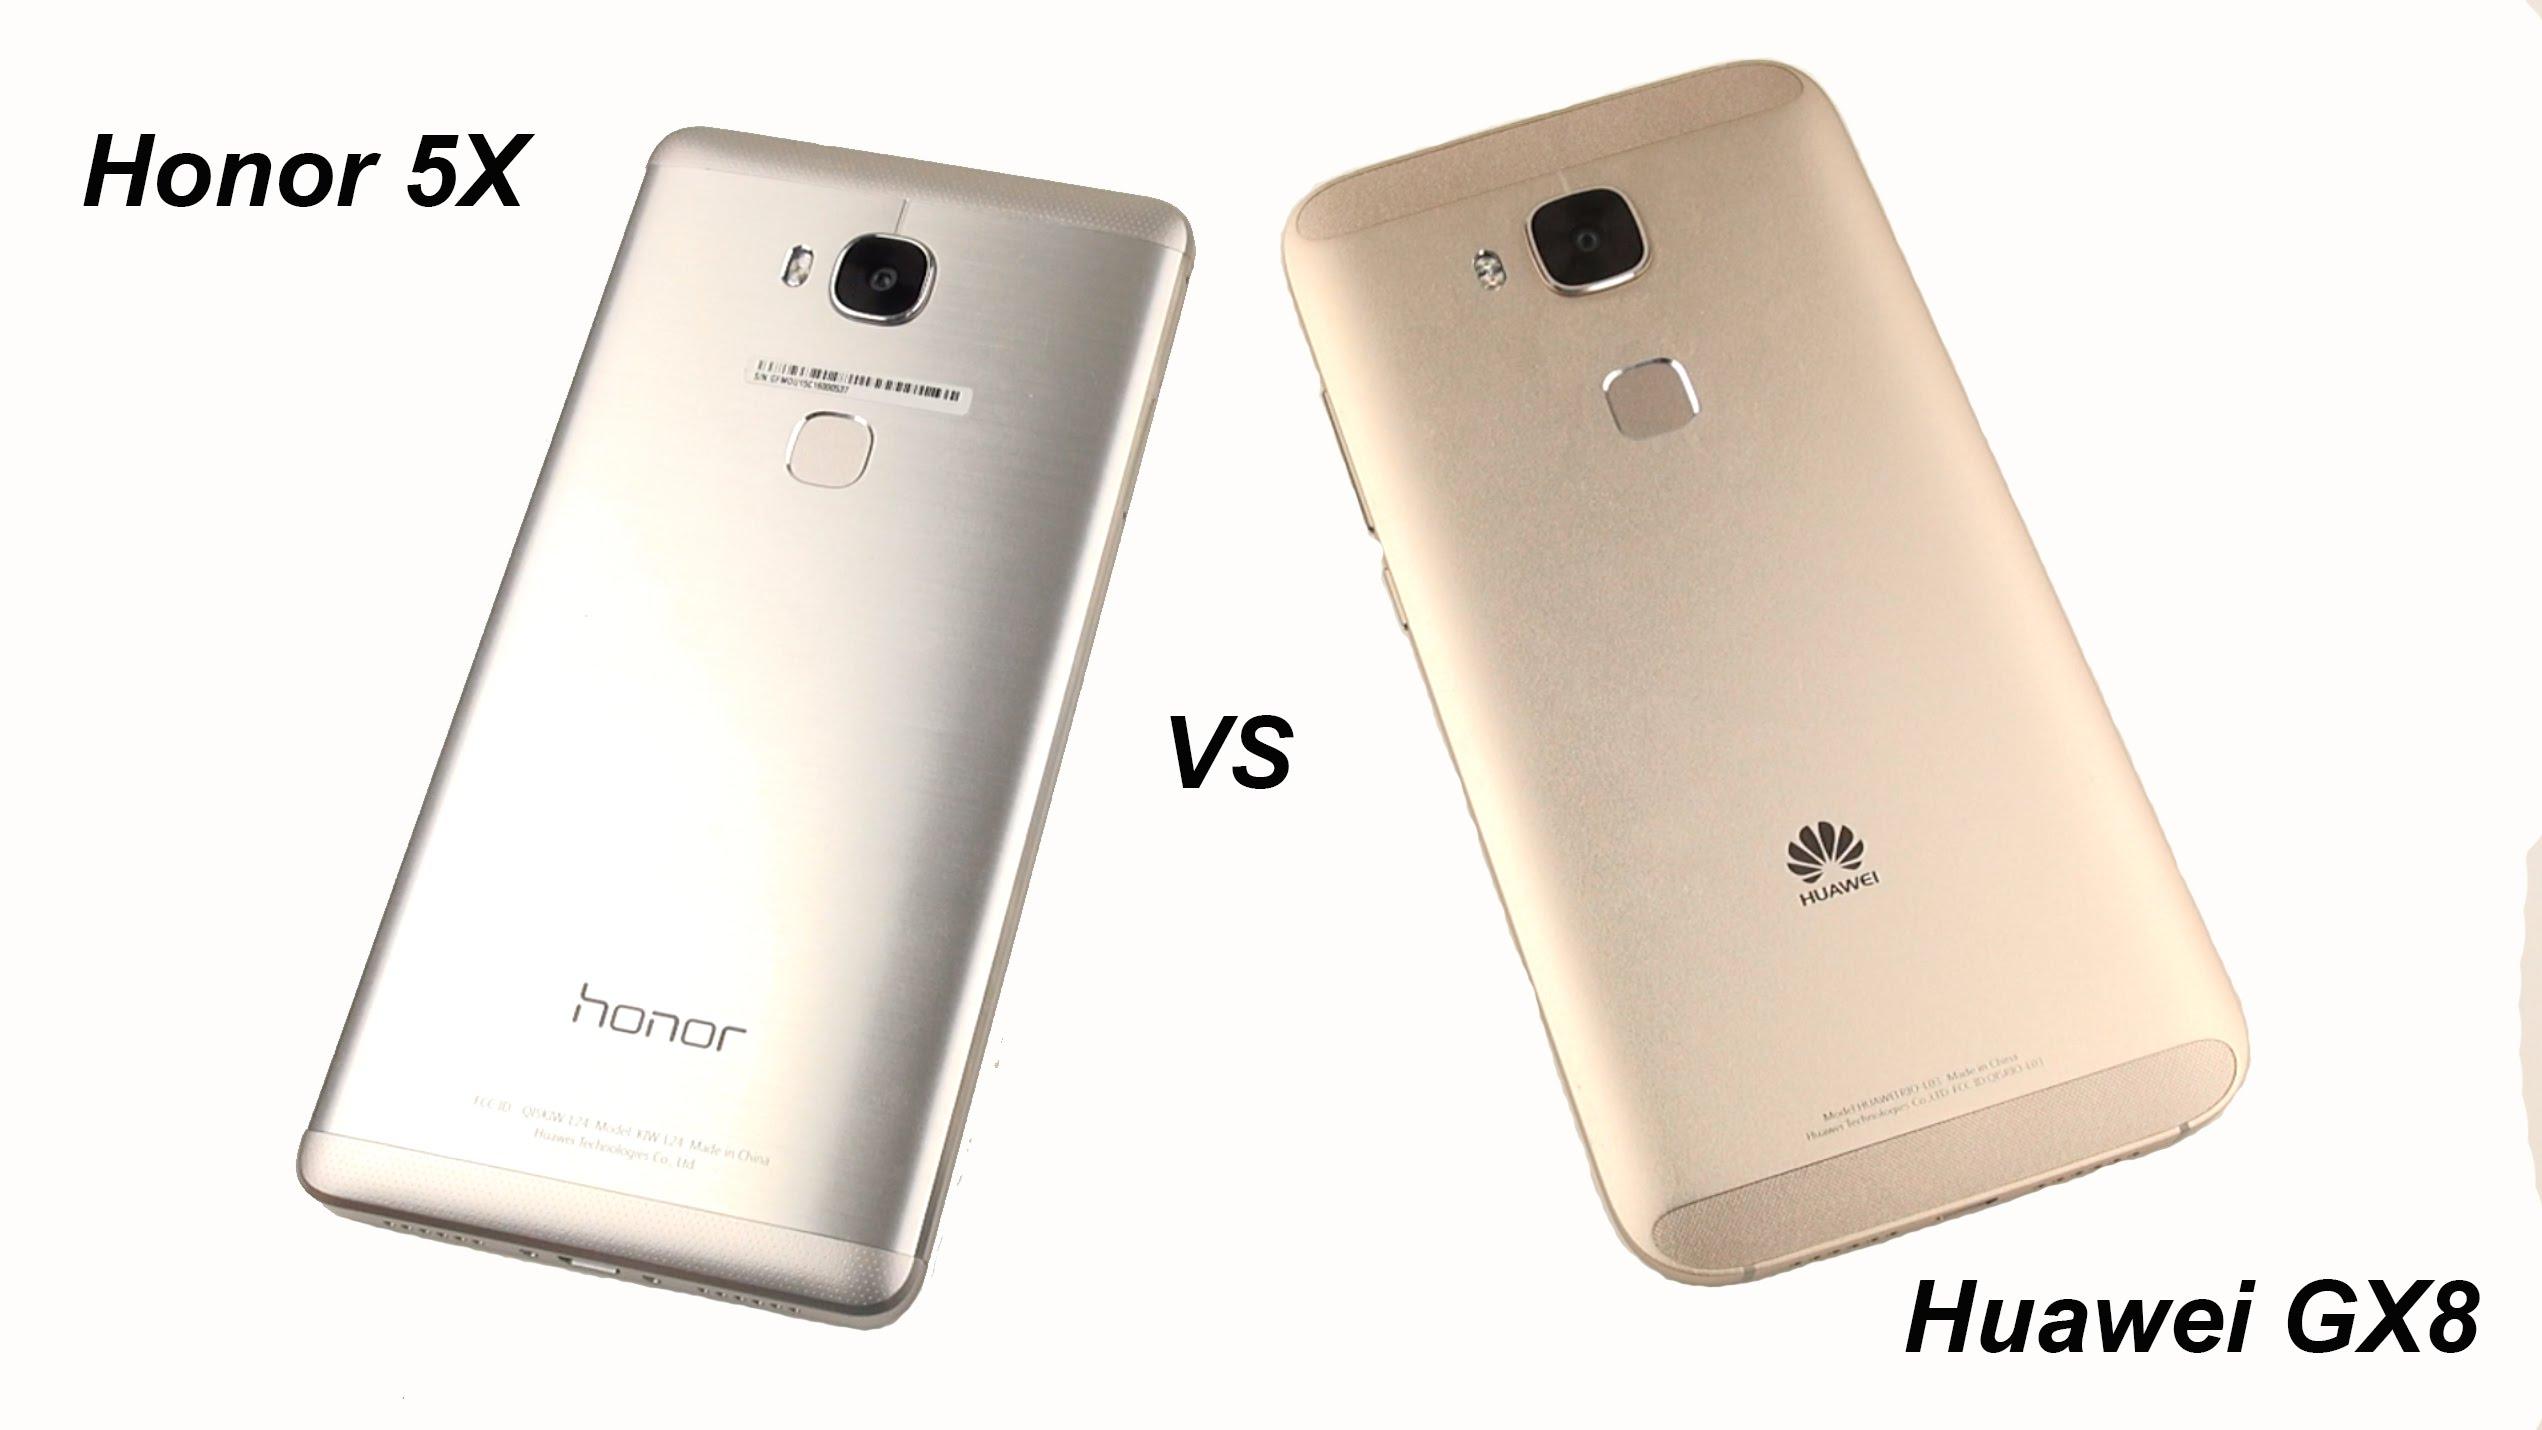 Huawei GX8 Review: The Same as Honor 5X?